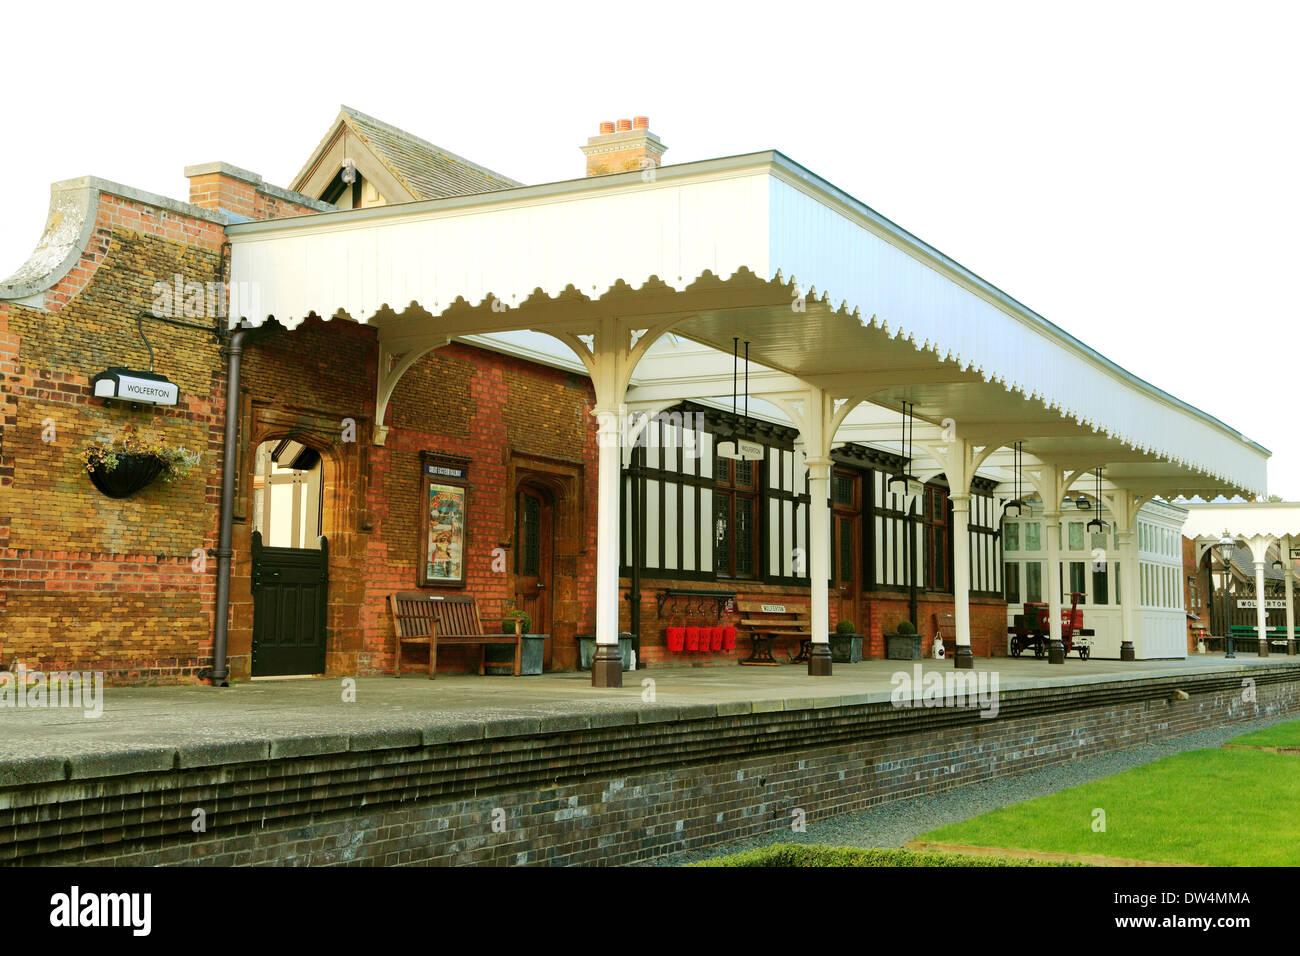 Wolferton Railway Station Platform, Norfolk, 19th century preserved stations England UK English - Stock Image